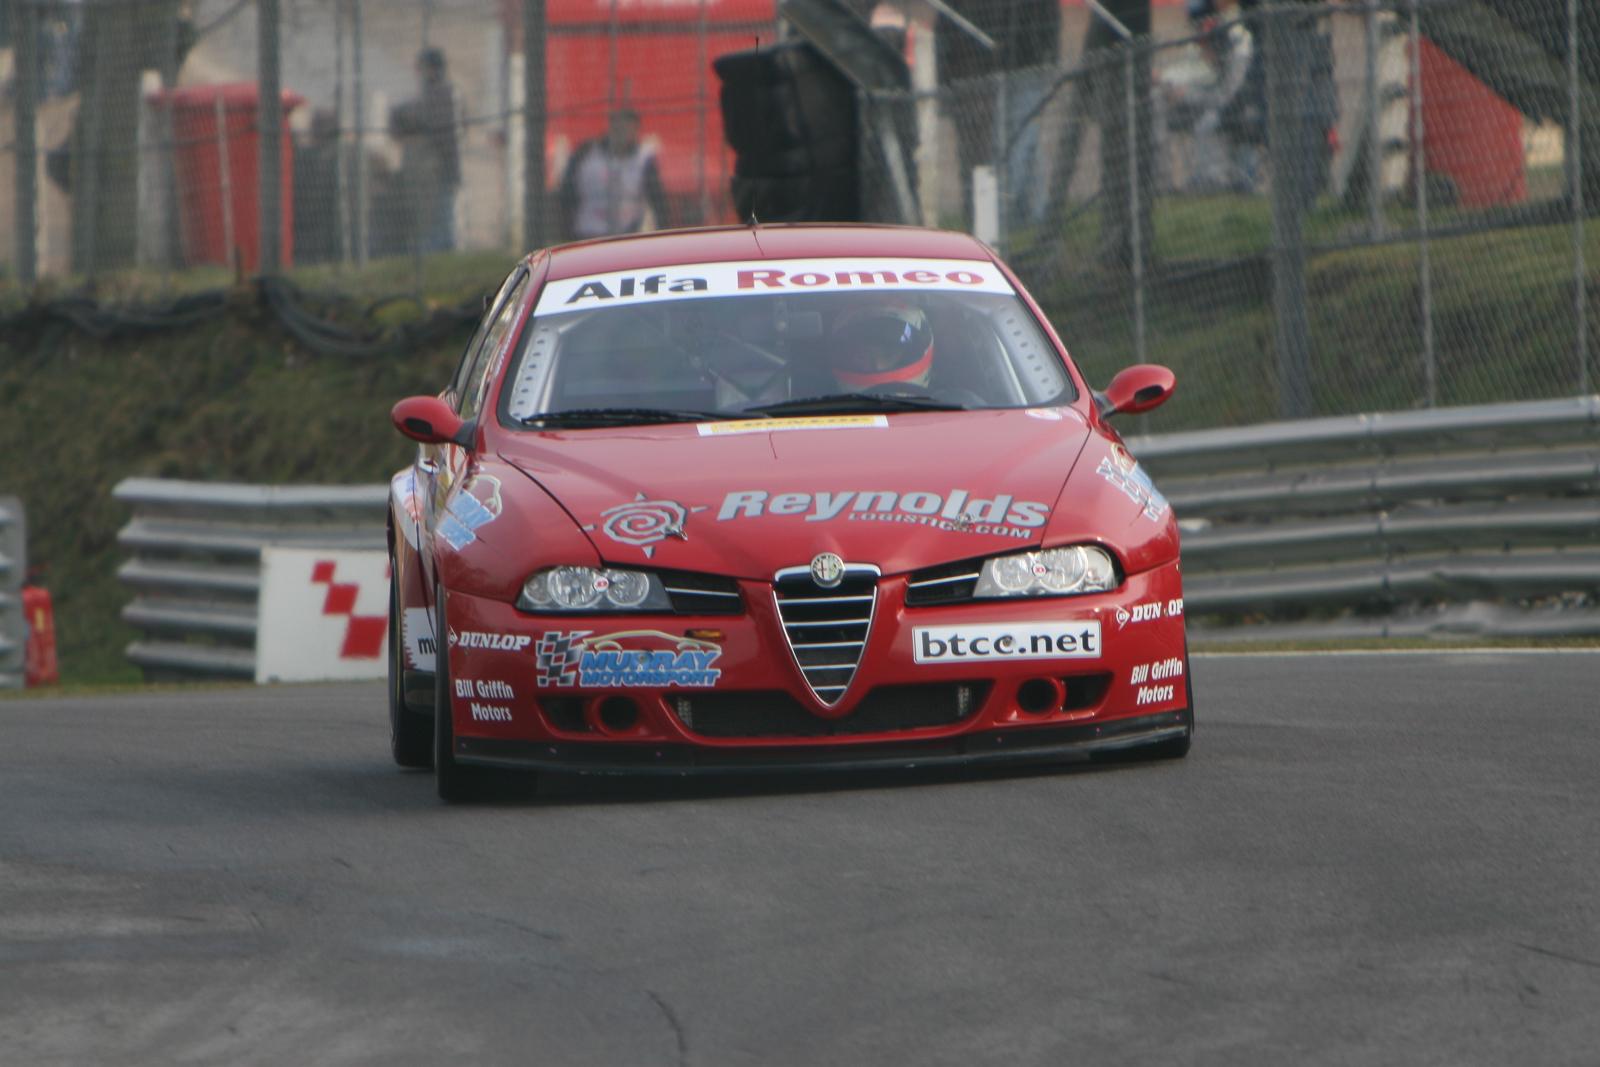 20070331 - BTCC Brands -070331 -004